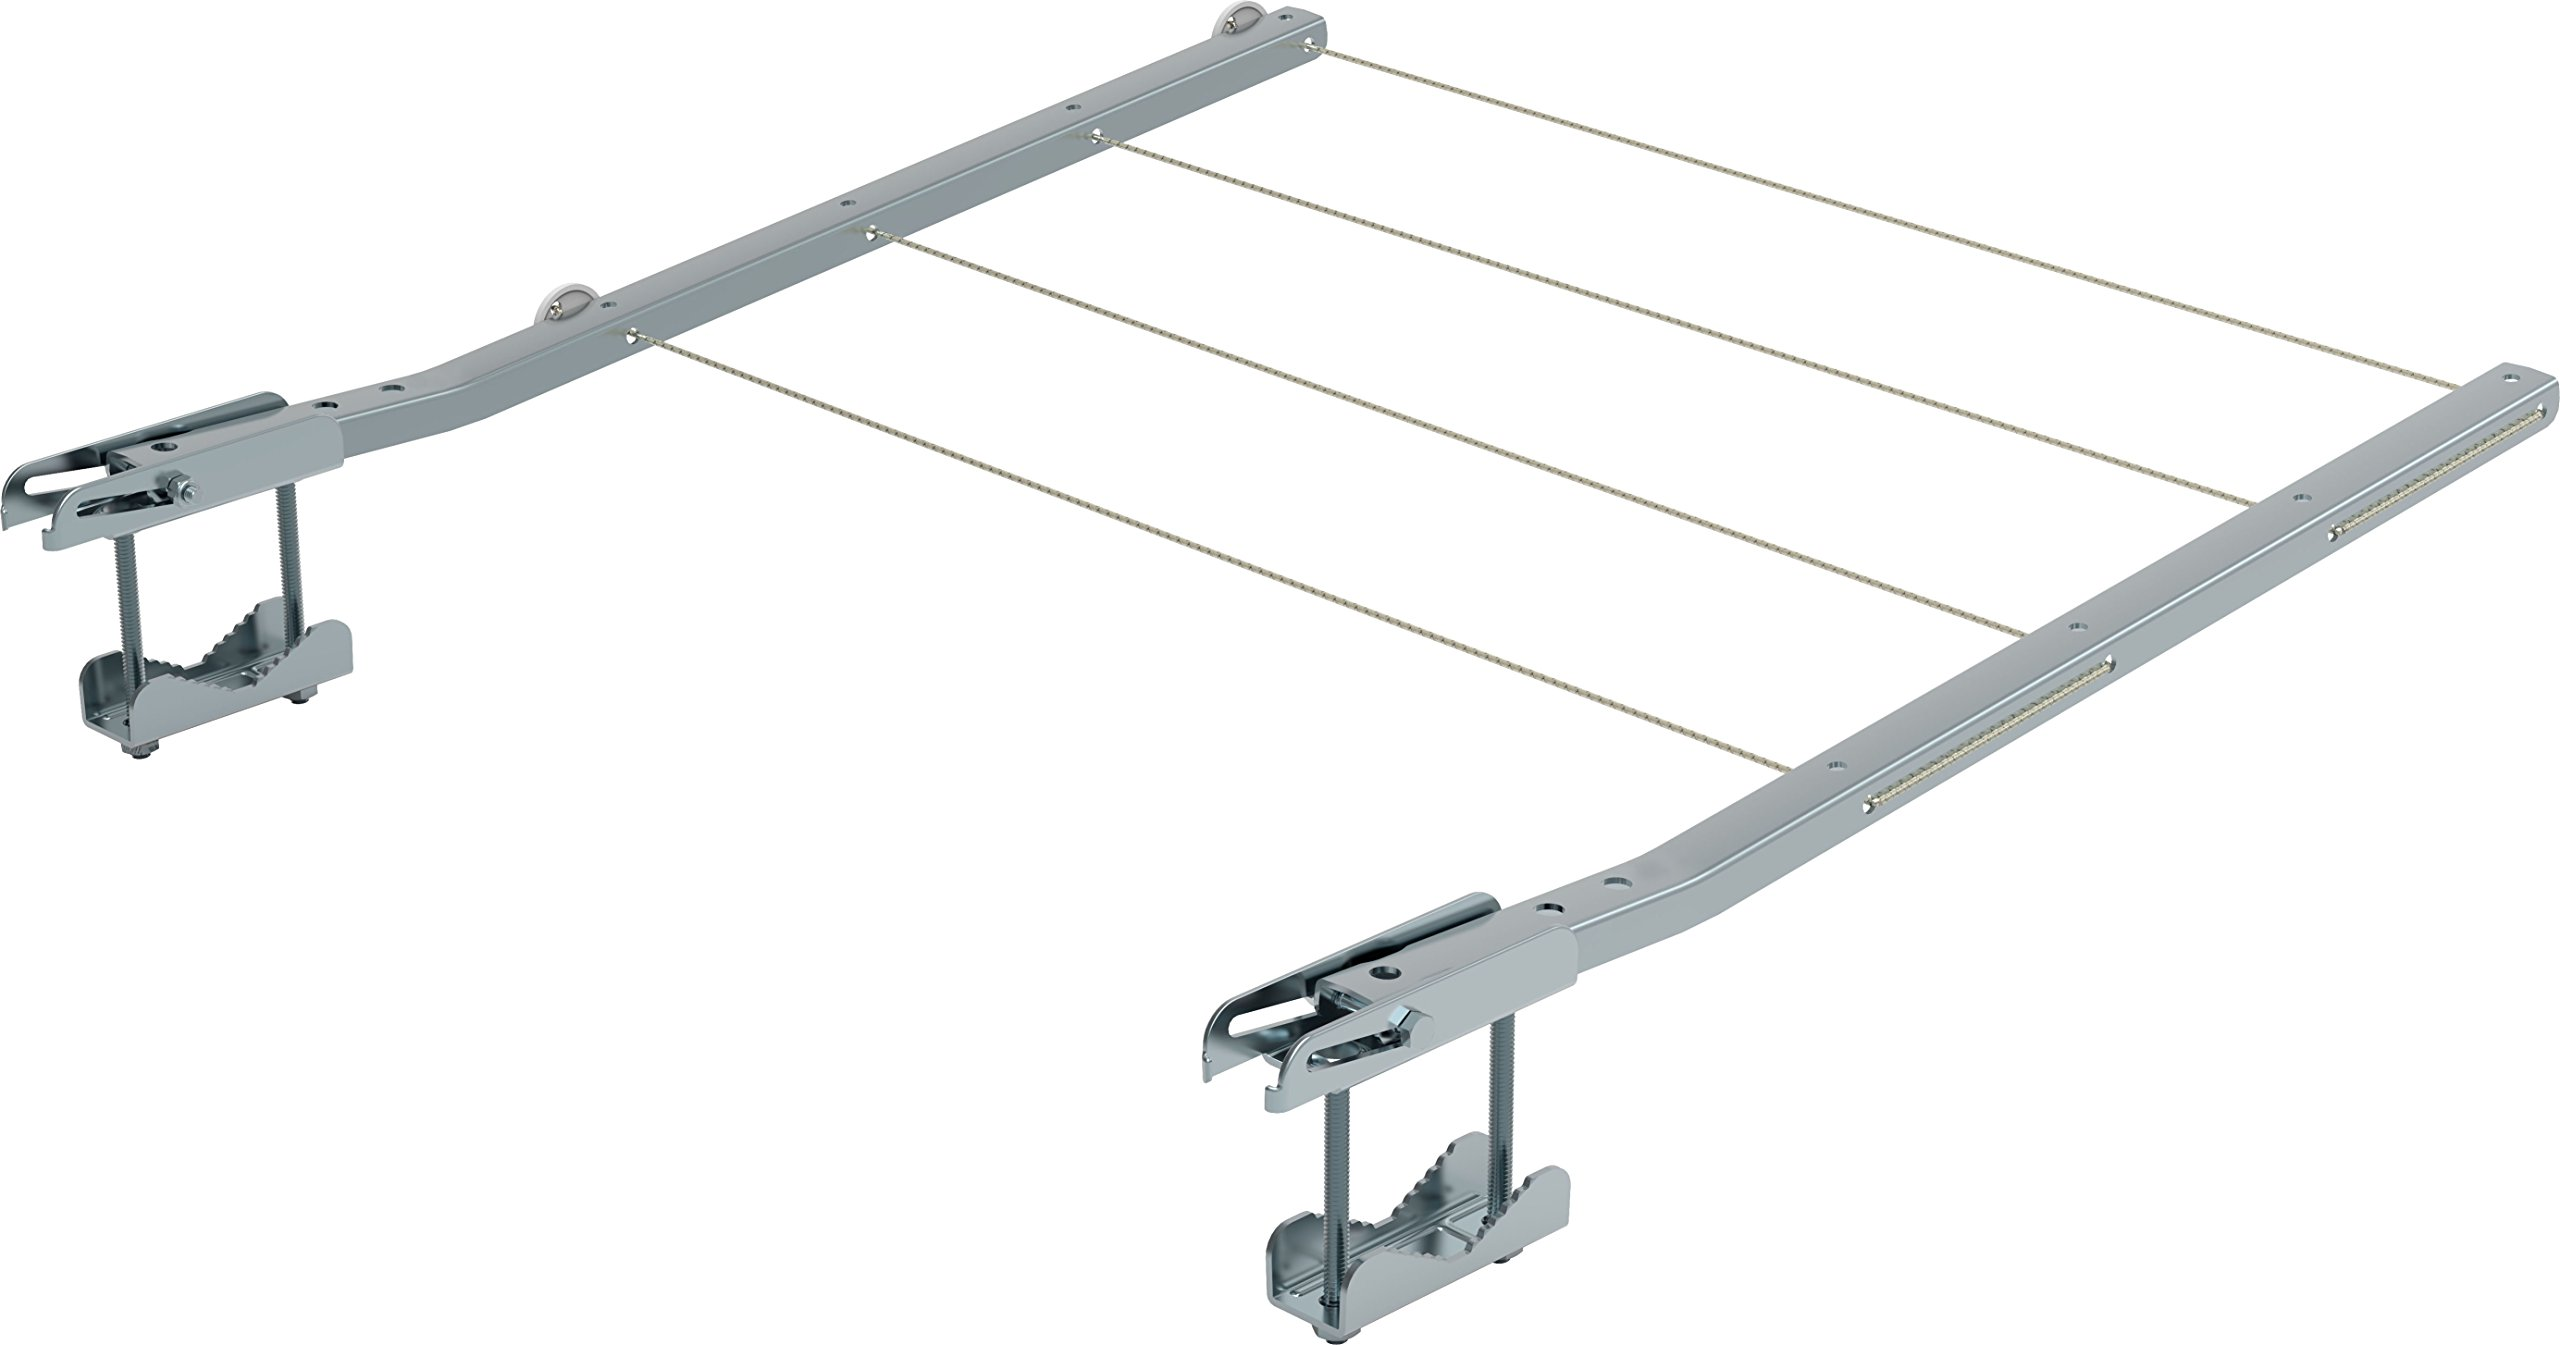 Gimi Ring Tendedero de balcón de Acero galvanizado, 20 m de Longitud de tendido